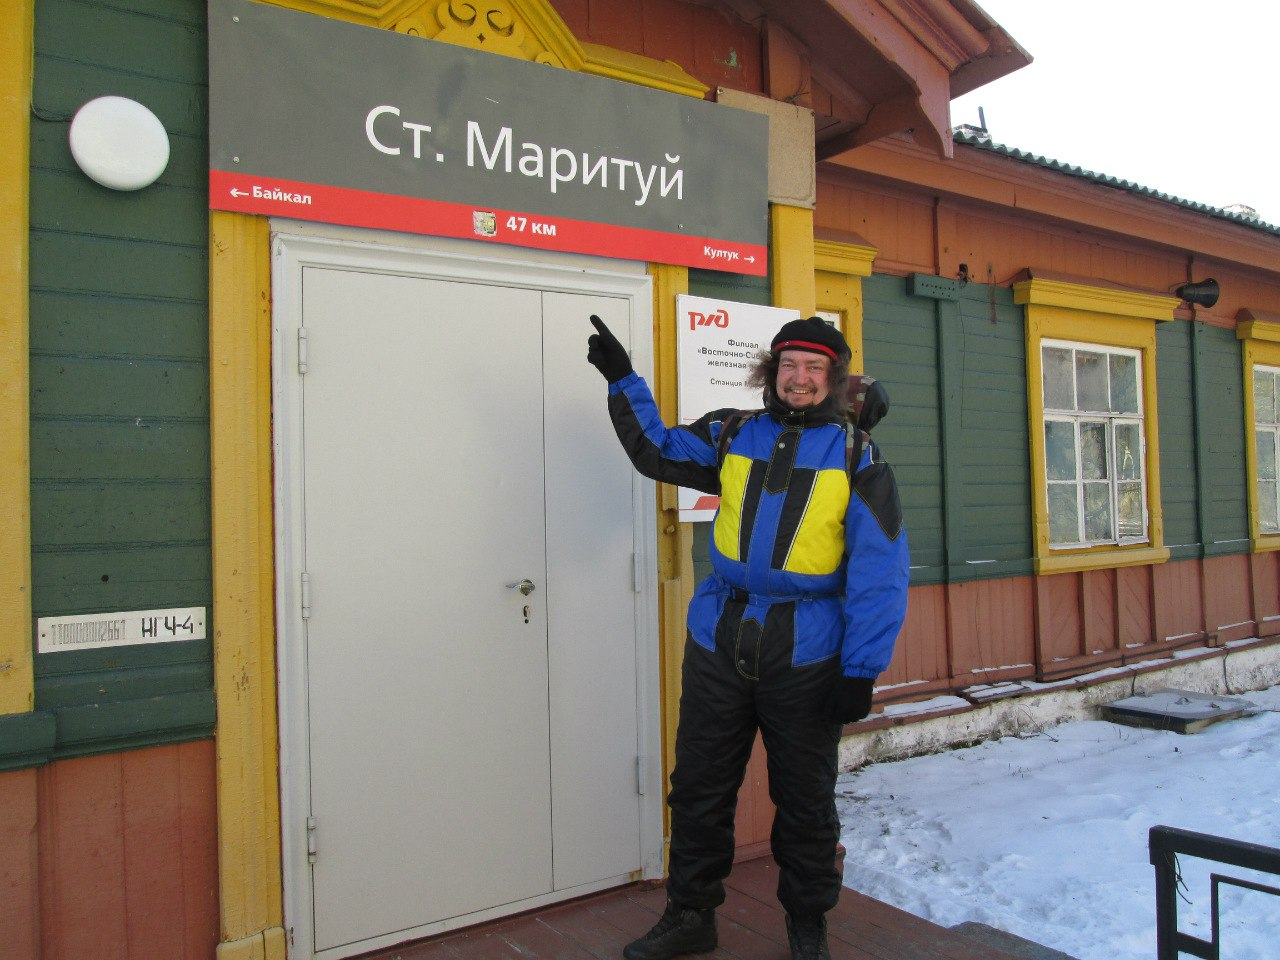 Станция Маритуй, КБЖД, ноябрь 2015